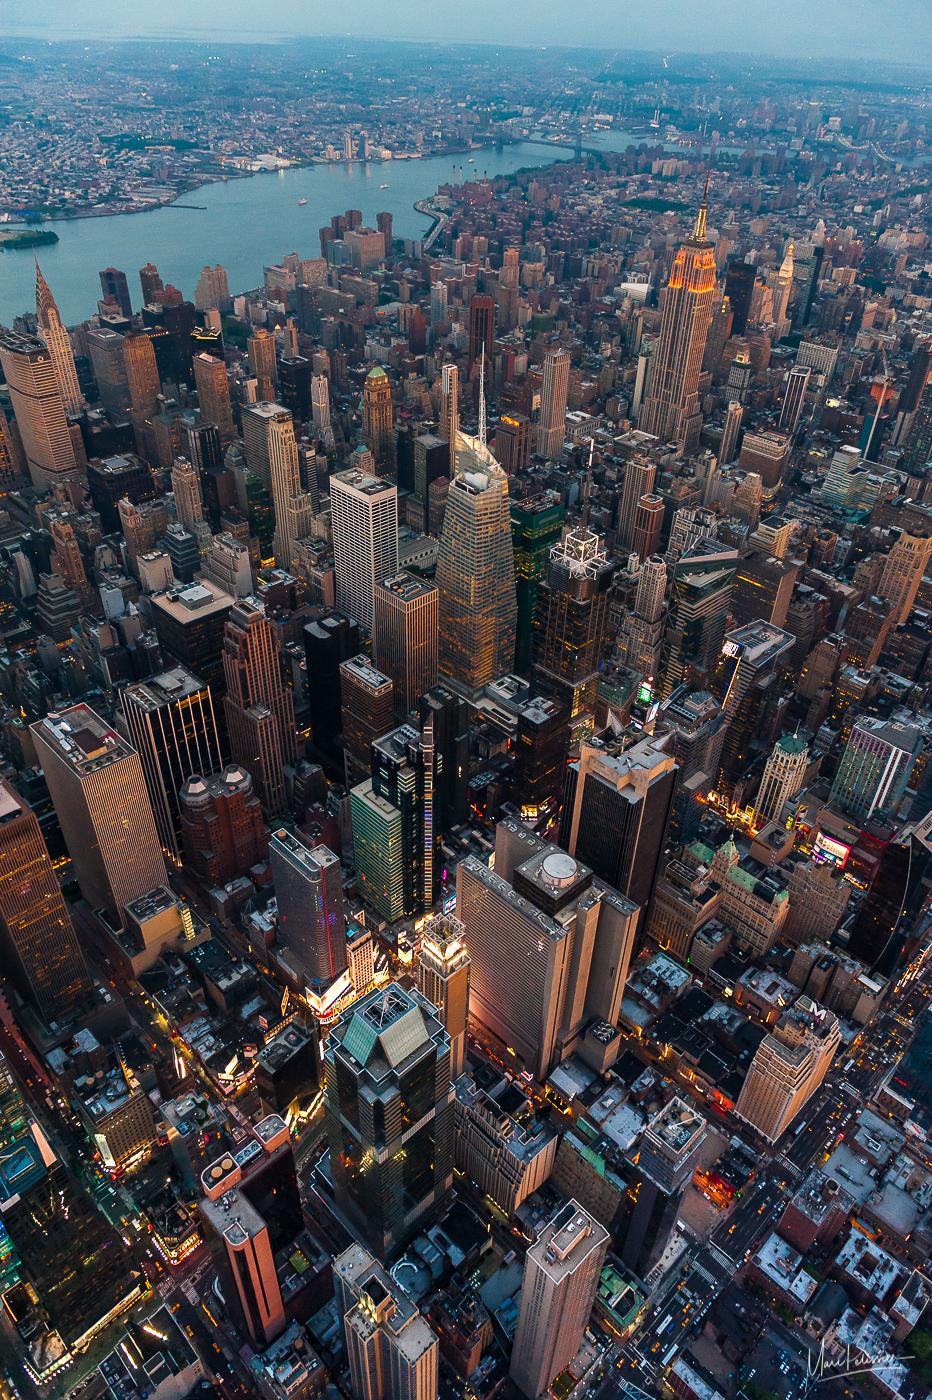 Manhattan Aerial near Top of the rock, USA